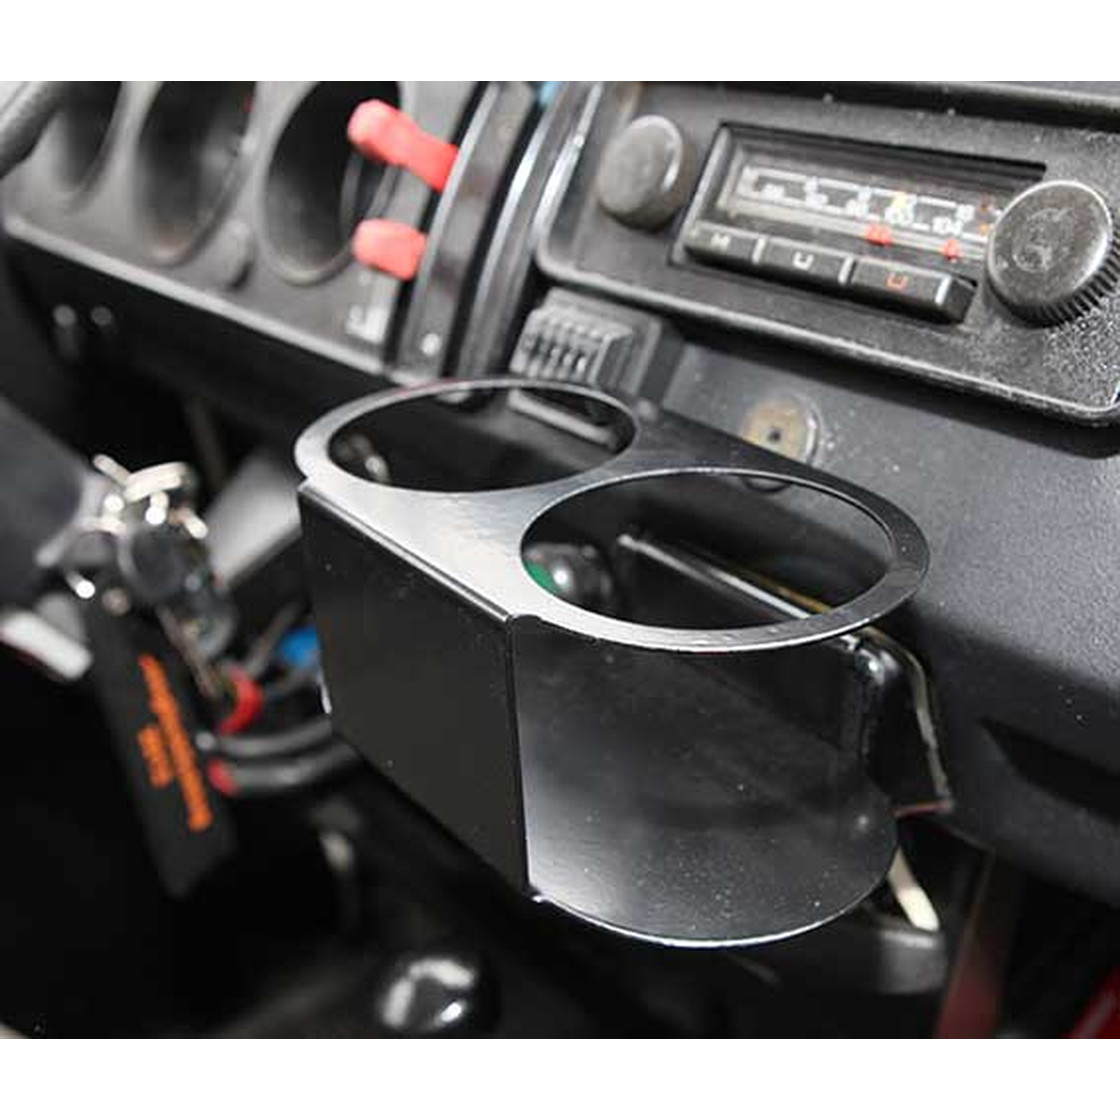 Type2 bay Cup Holder VW Type 2 Bay 8 67 - 7 79 - BUS-ok de